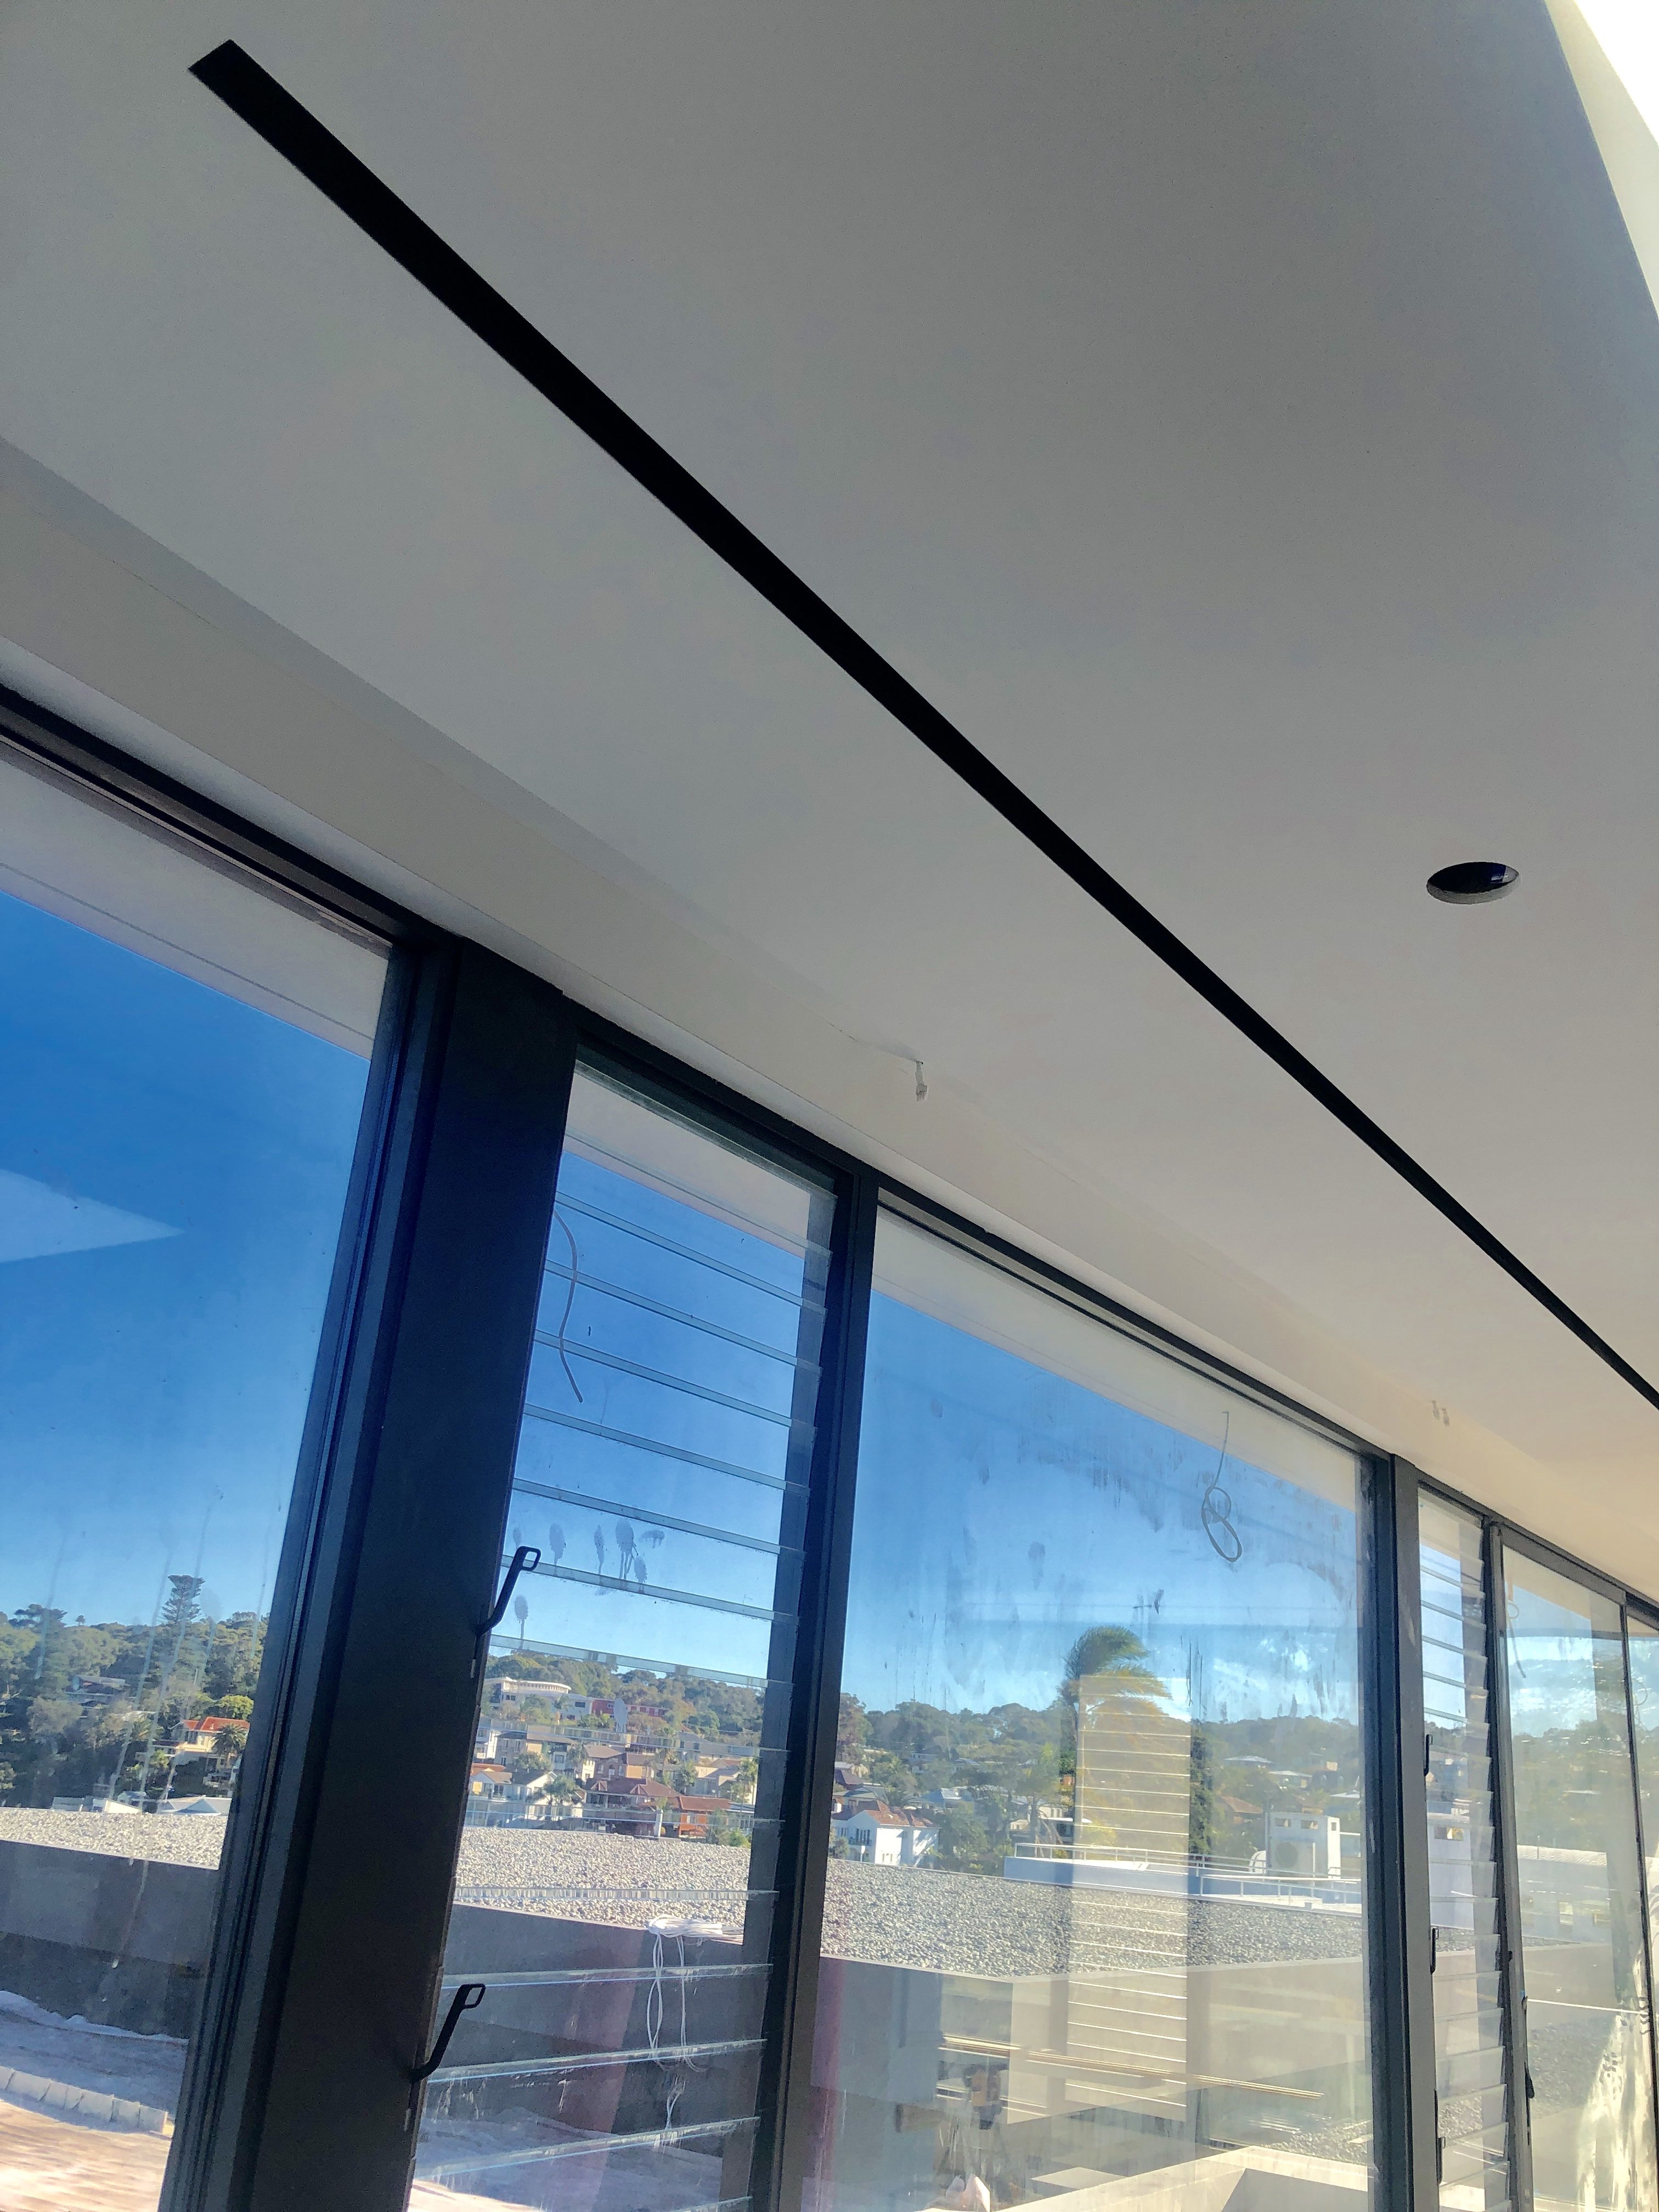 Air conditioning diffuser minimalist flangeless Slot